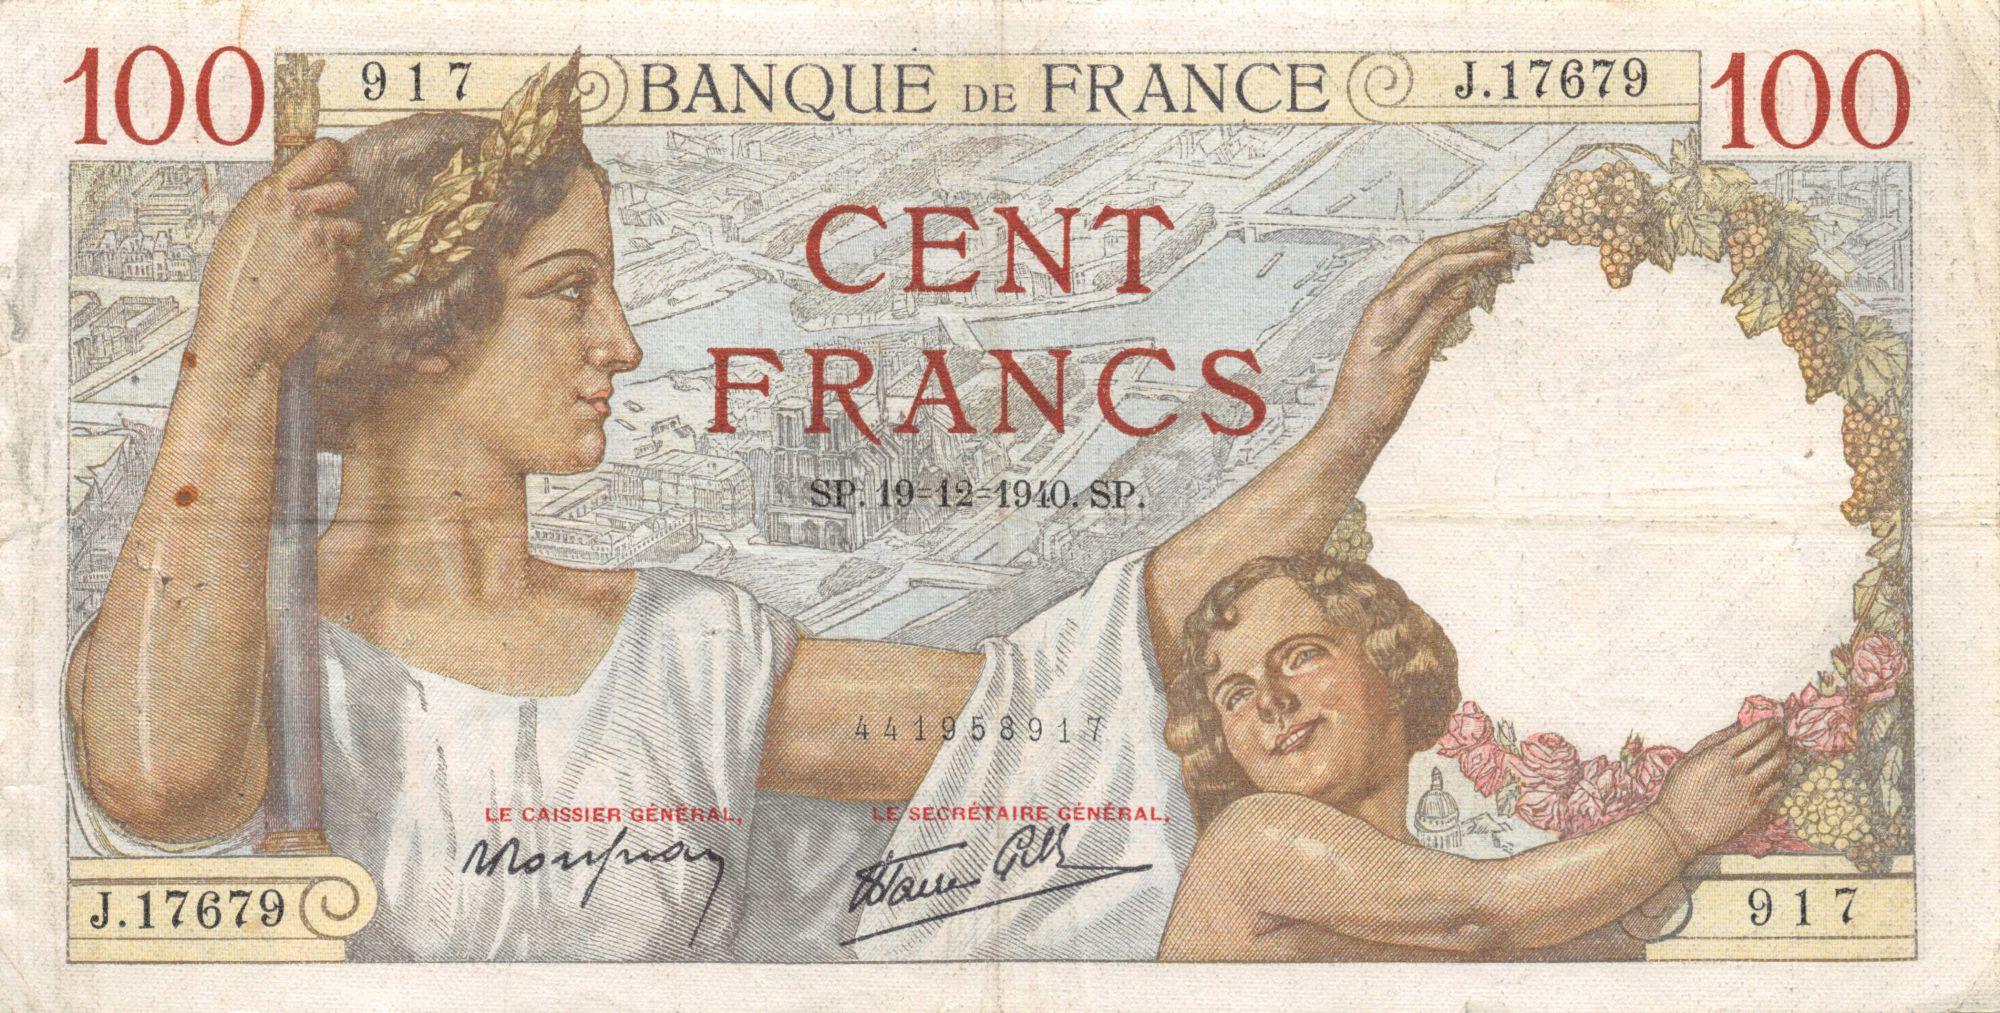 France 100 Francs Sully - 19-12-1940 Série J.17679 - TB+